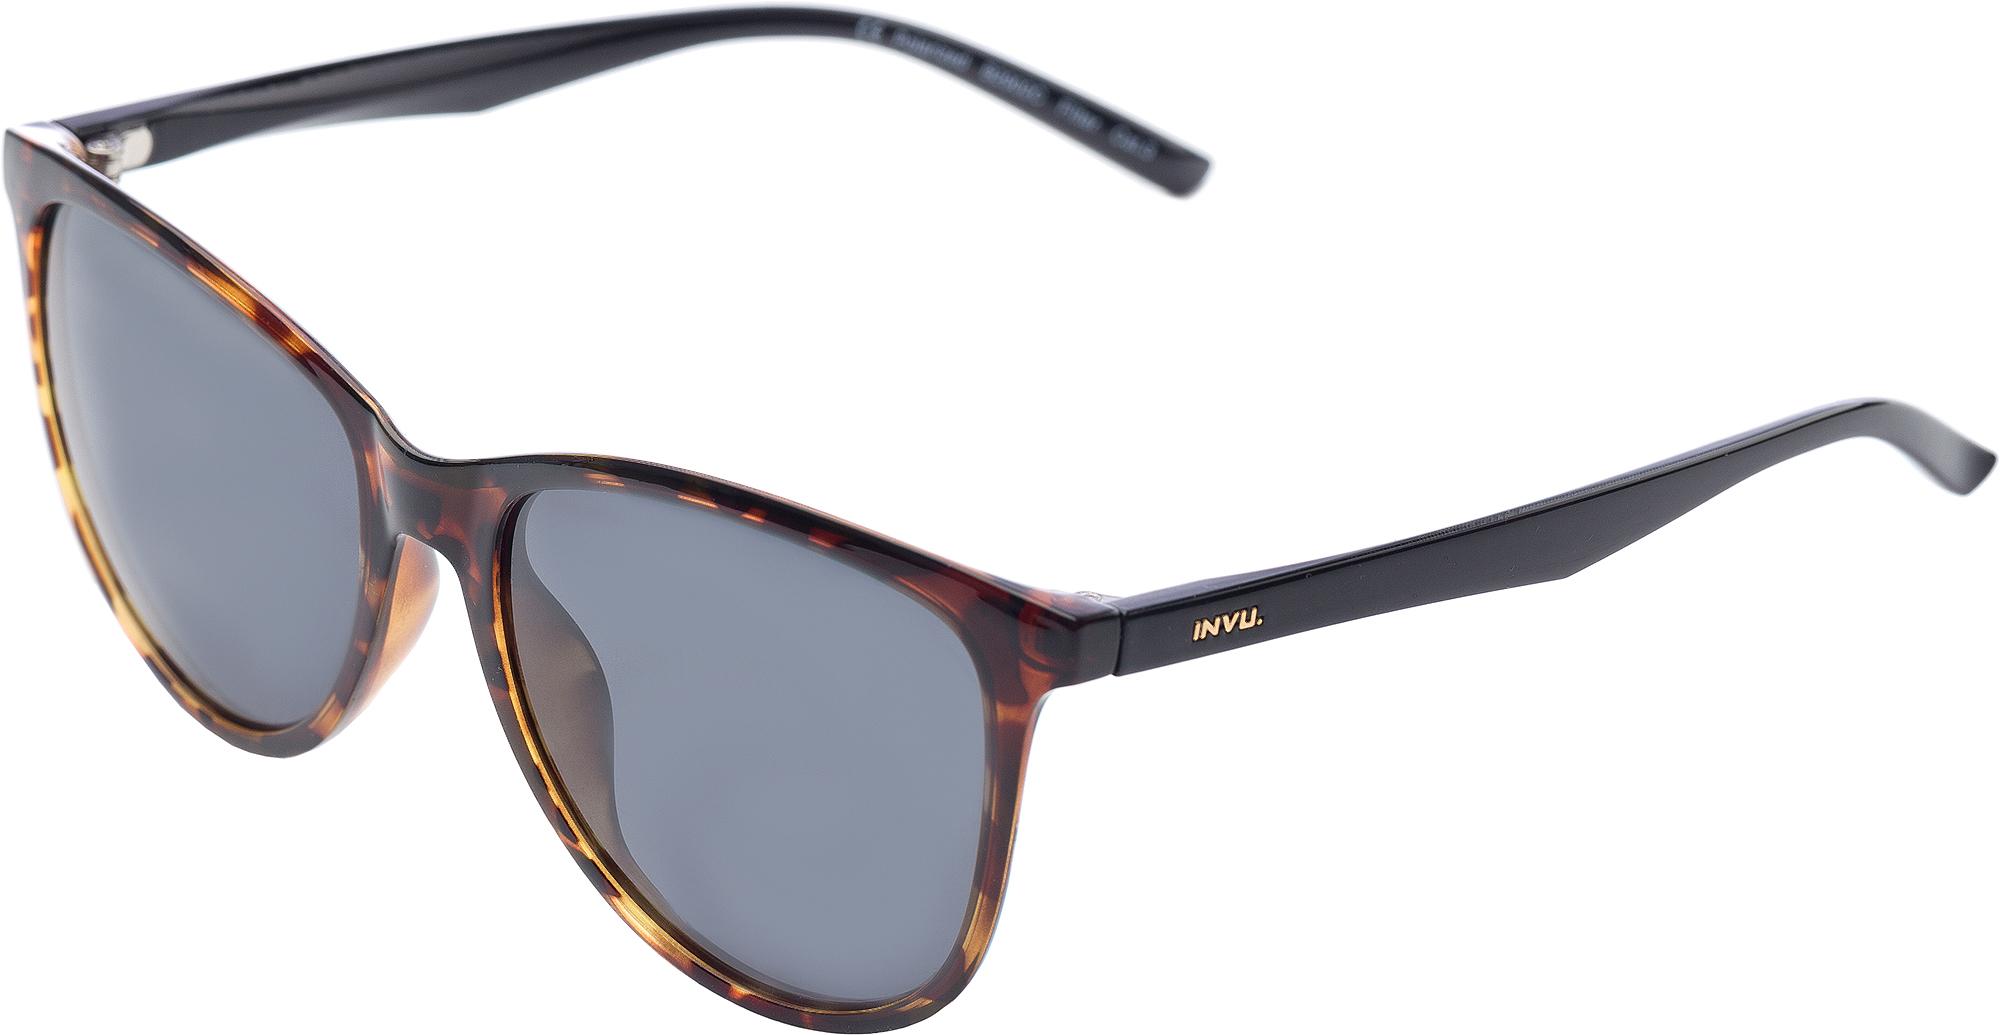 Invu Солнцезащитные очки